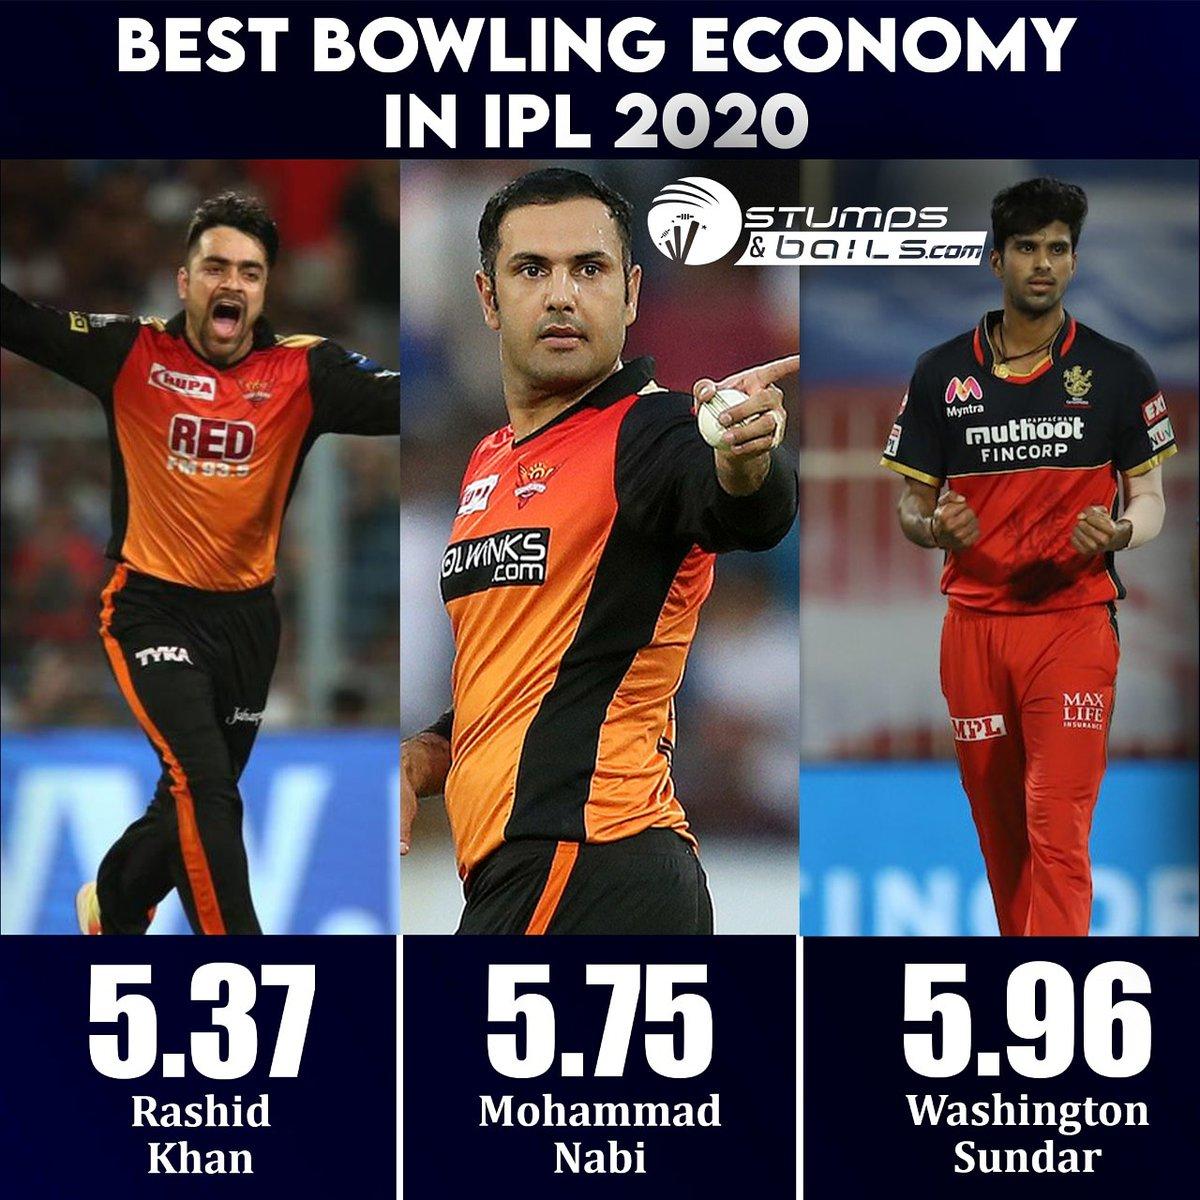 Superb bowlers stats in #IPL2020 🤩🥳 #RashidKhan #MohammadNabi #WashingtonSundar  Follow us @stumpnbails #IPL2020finals #IPLinUAE #IPLFinals #dream11iplfinal #Dream11IPL2020 #MI #DC #MIvsDC #DCvMI #MumbaiIndians #DelhiCapitals #RohitSharma #SRH #RCB